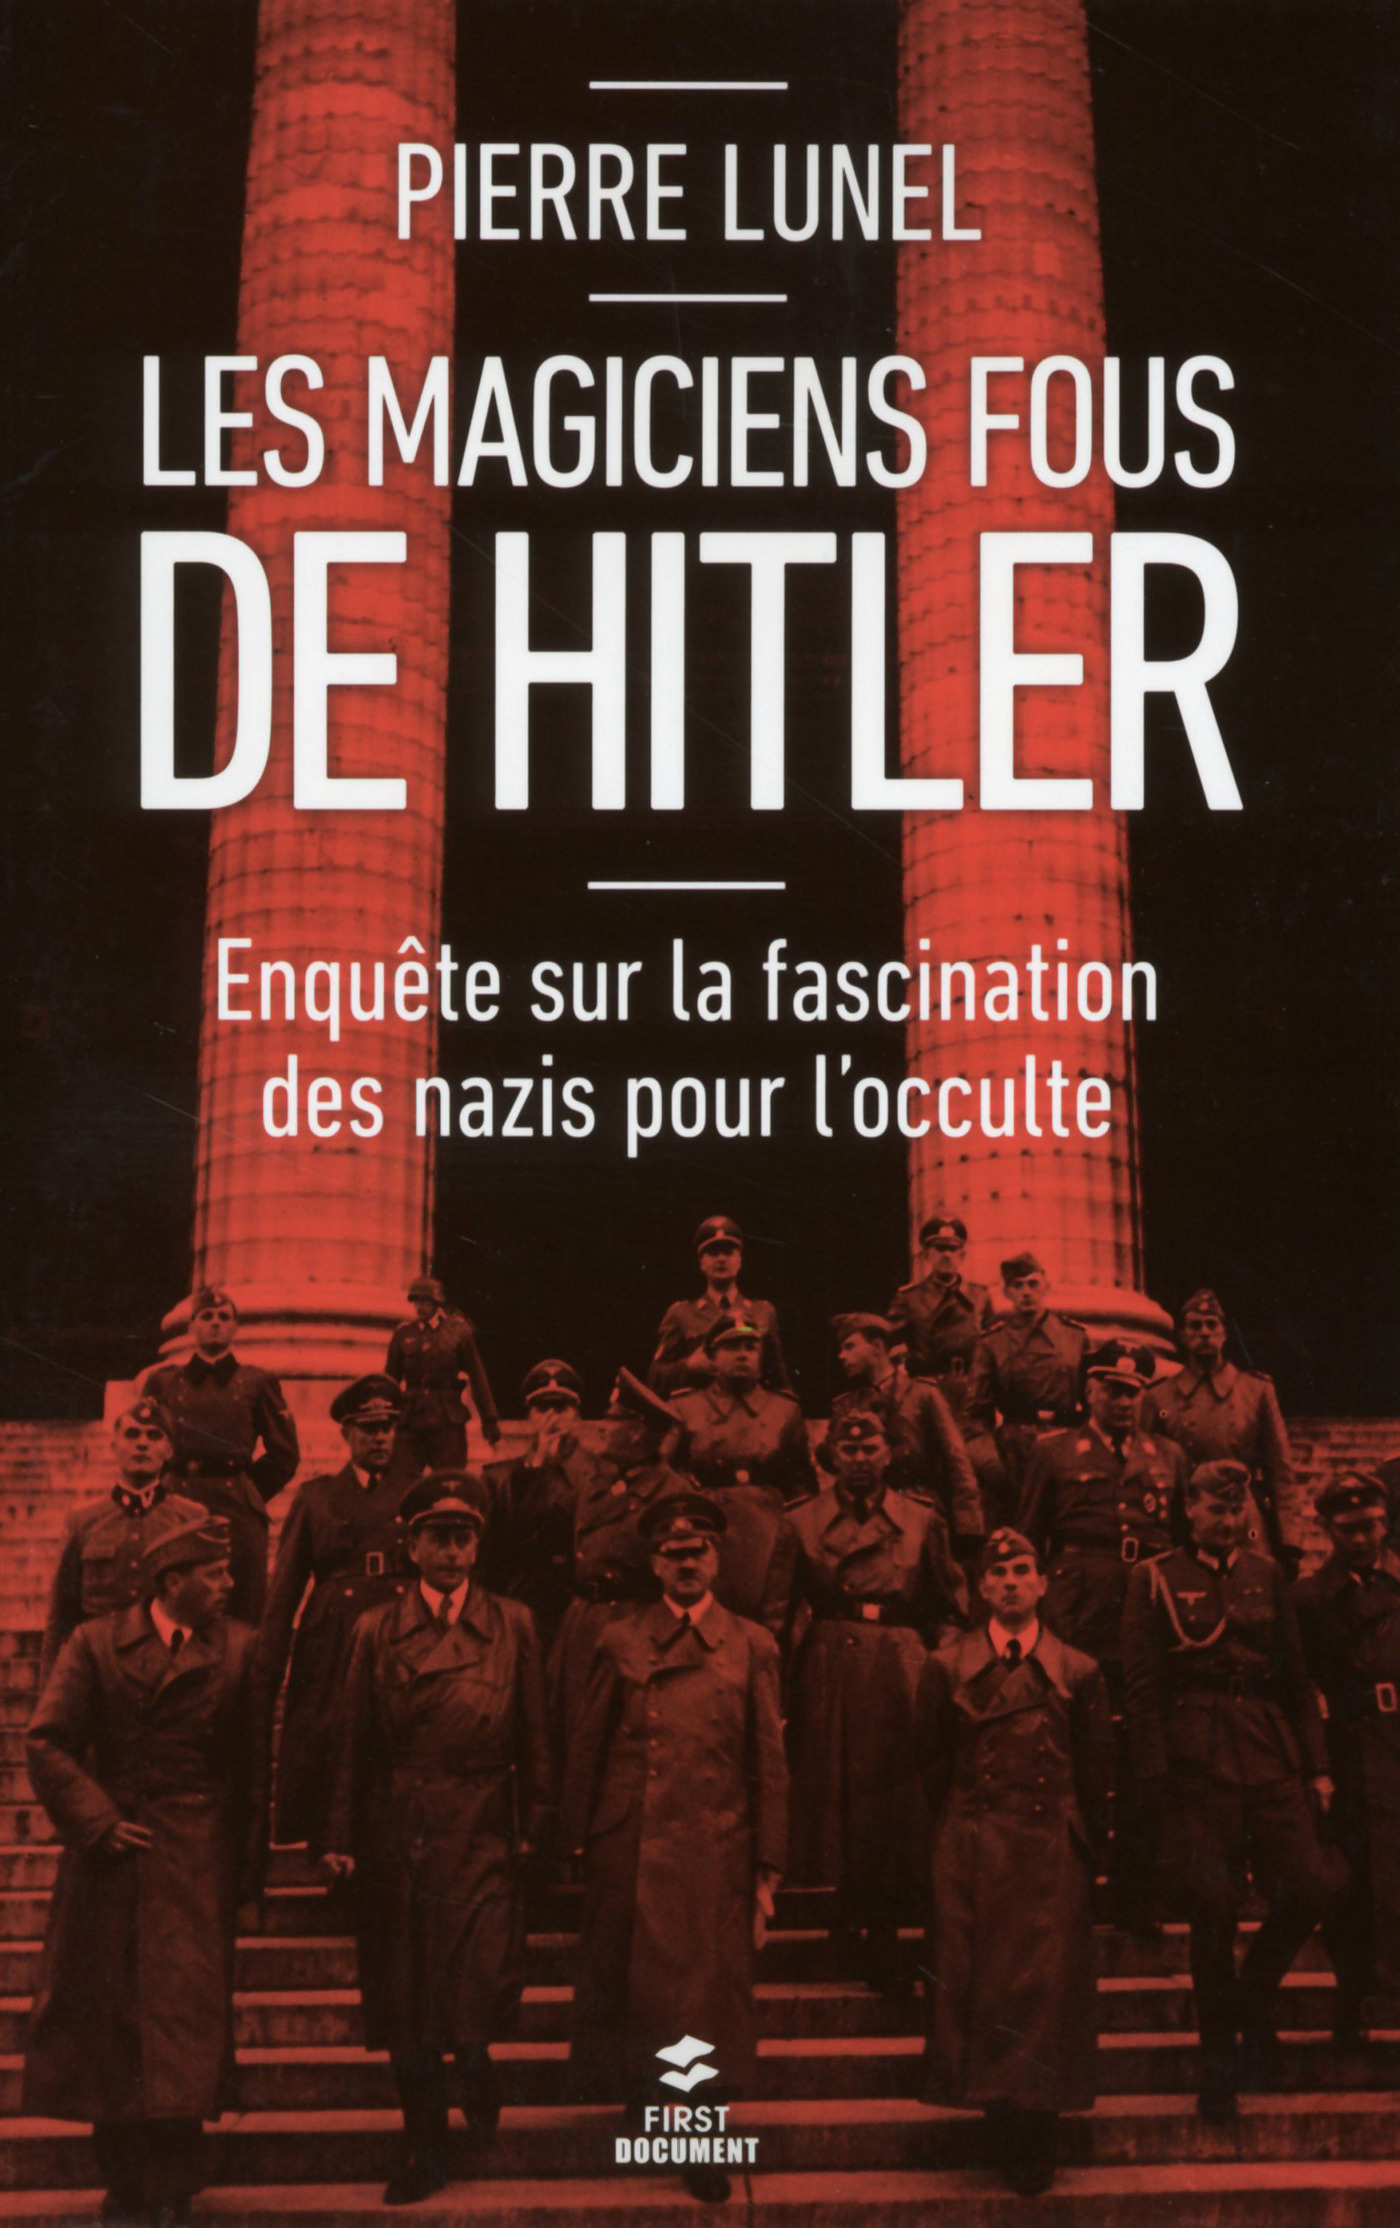 Les magiciens fous d'Hitler (ebook)